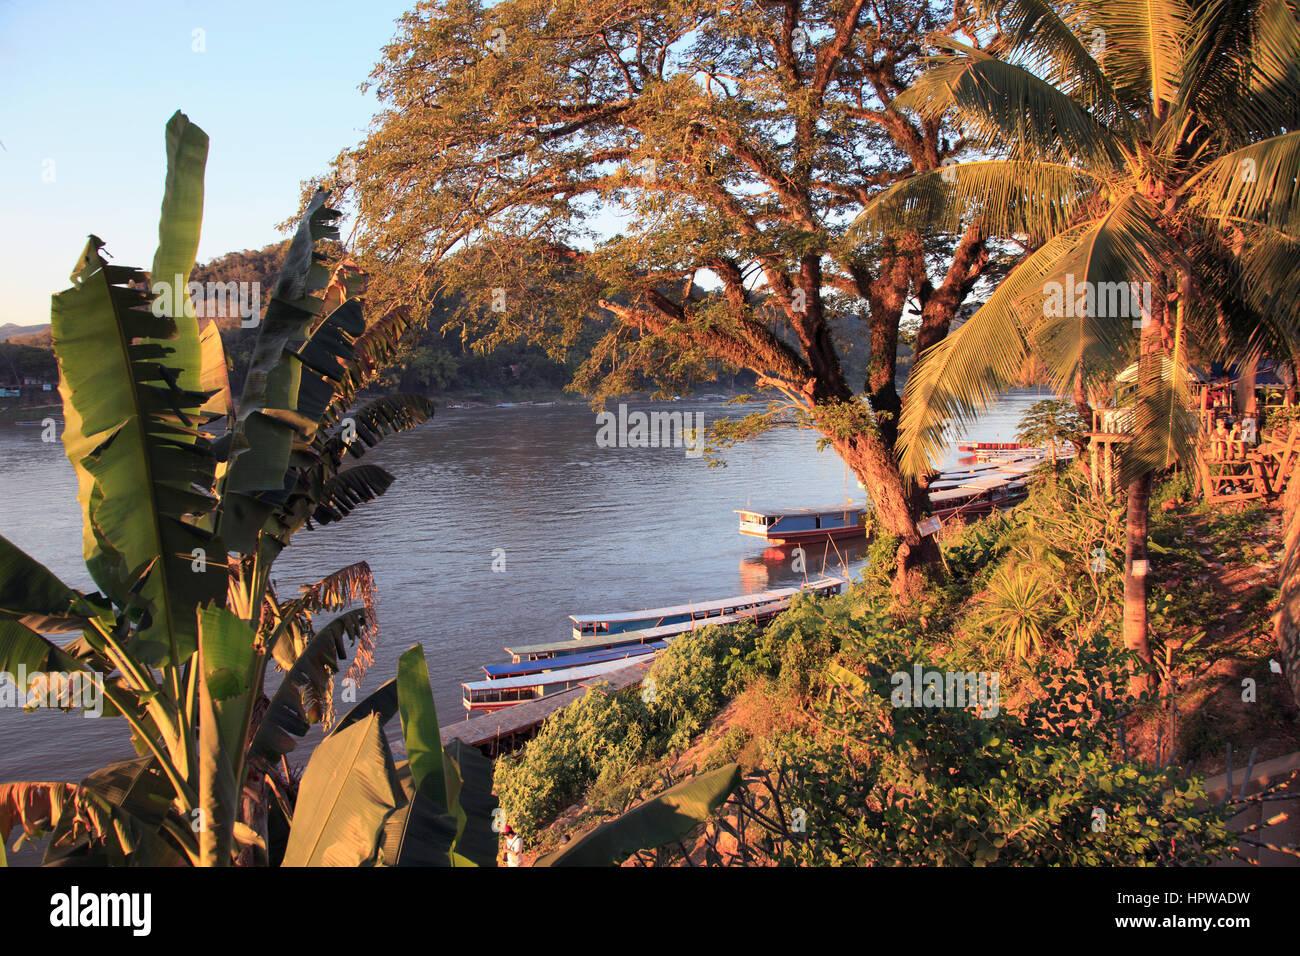 Laos, Luang Prabang, el río Mekong, Foto de stock